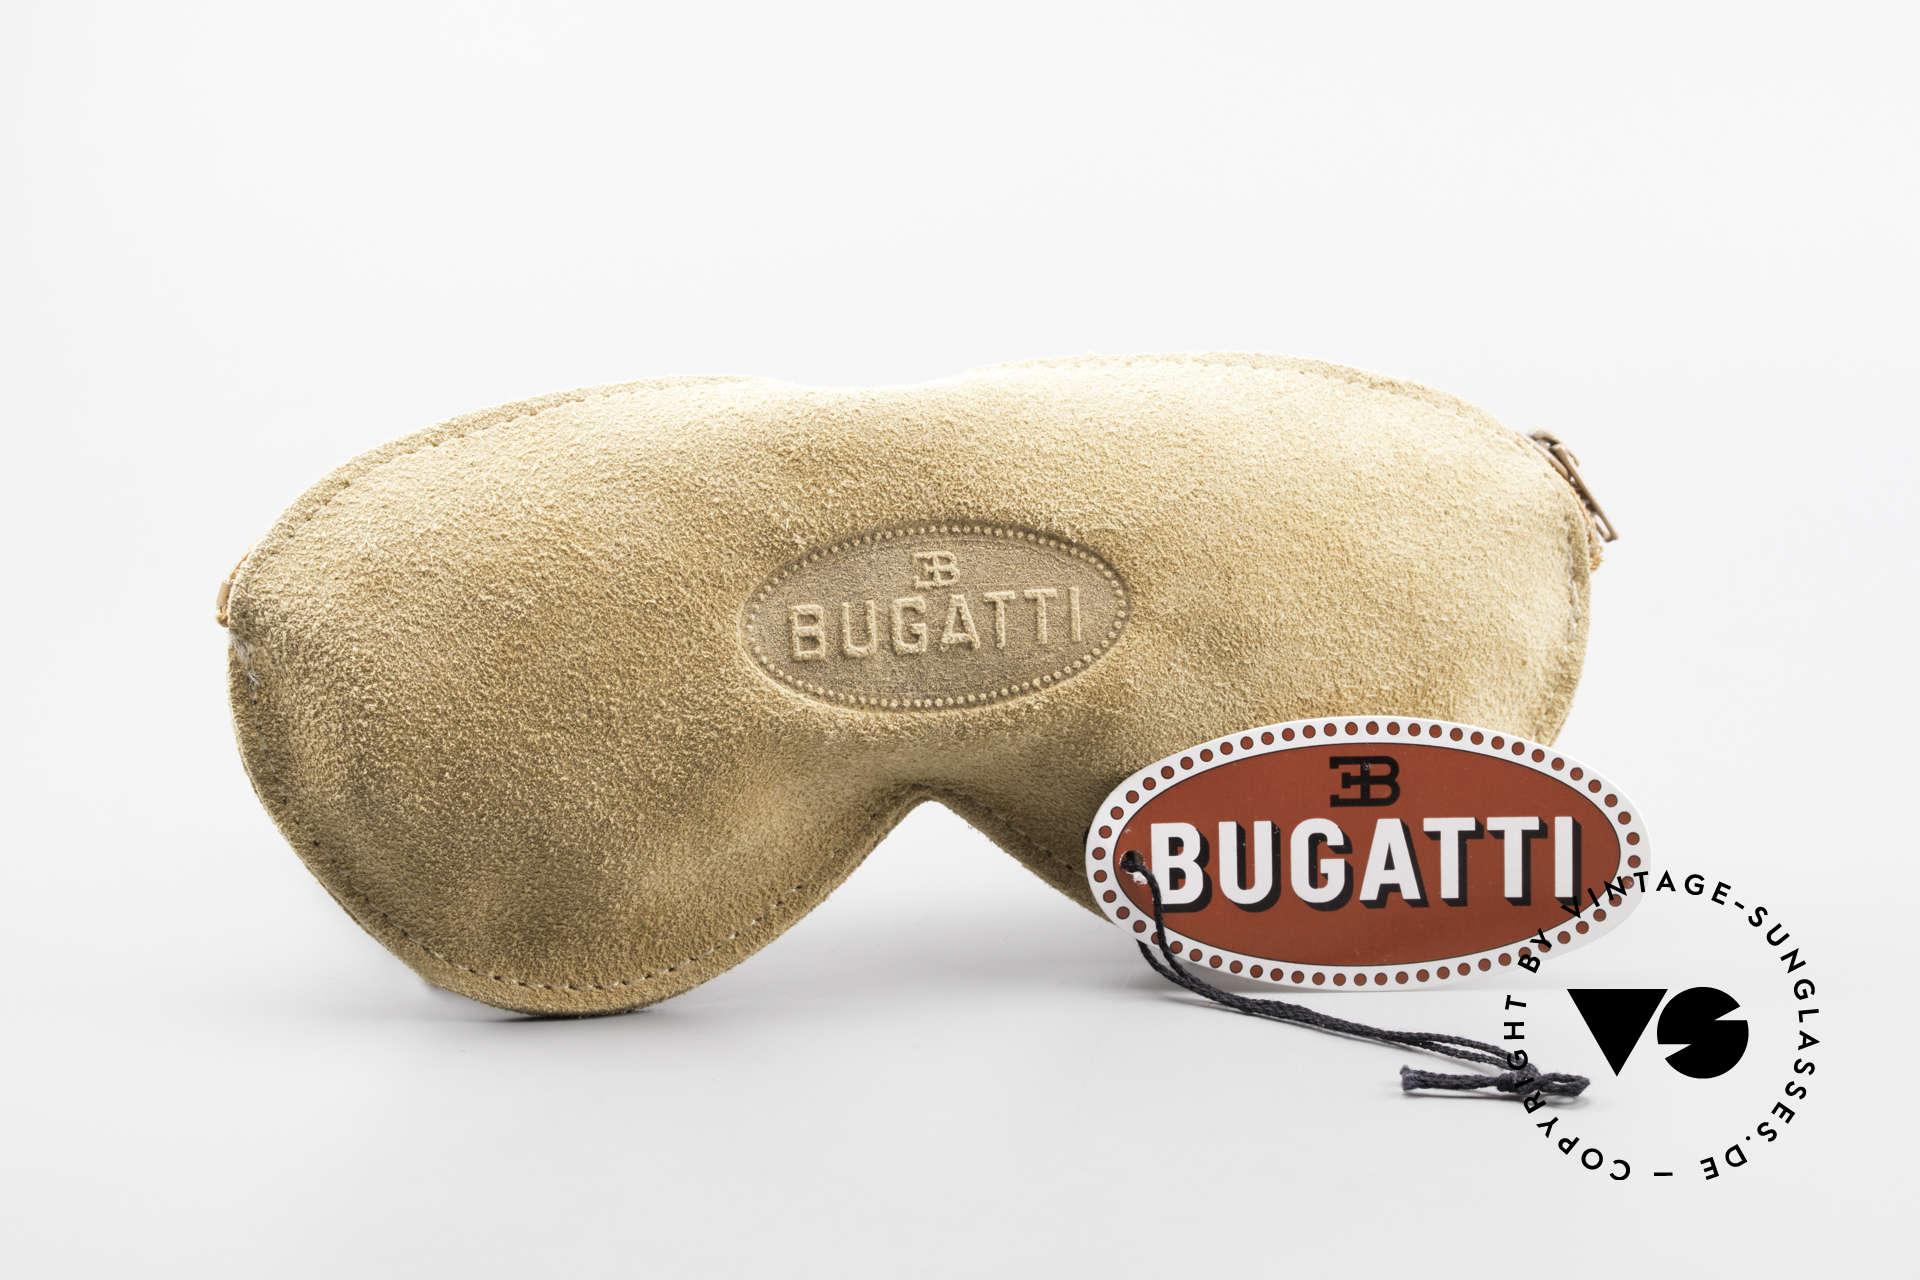 Bugatti 08105 Old Vintage Glasses 80's Men, Size: medium, Made for Men